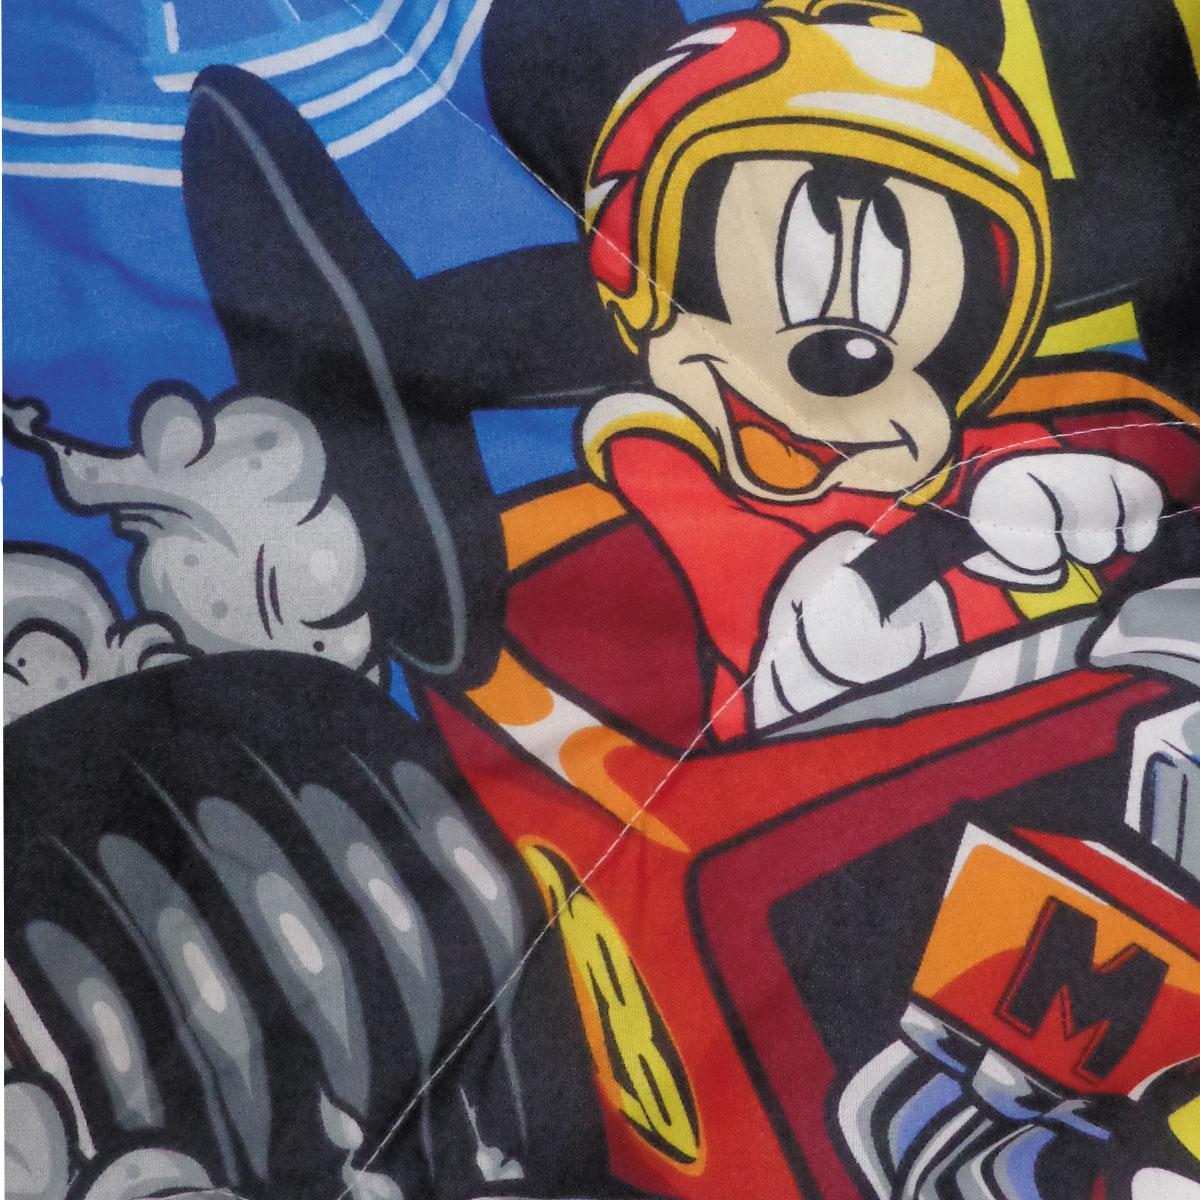 Edredom Infantil Disney Mickey Aventura Sobre Rodas Dupla Face Lepper